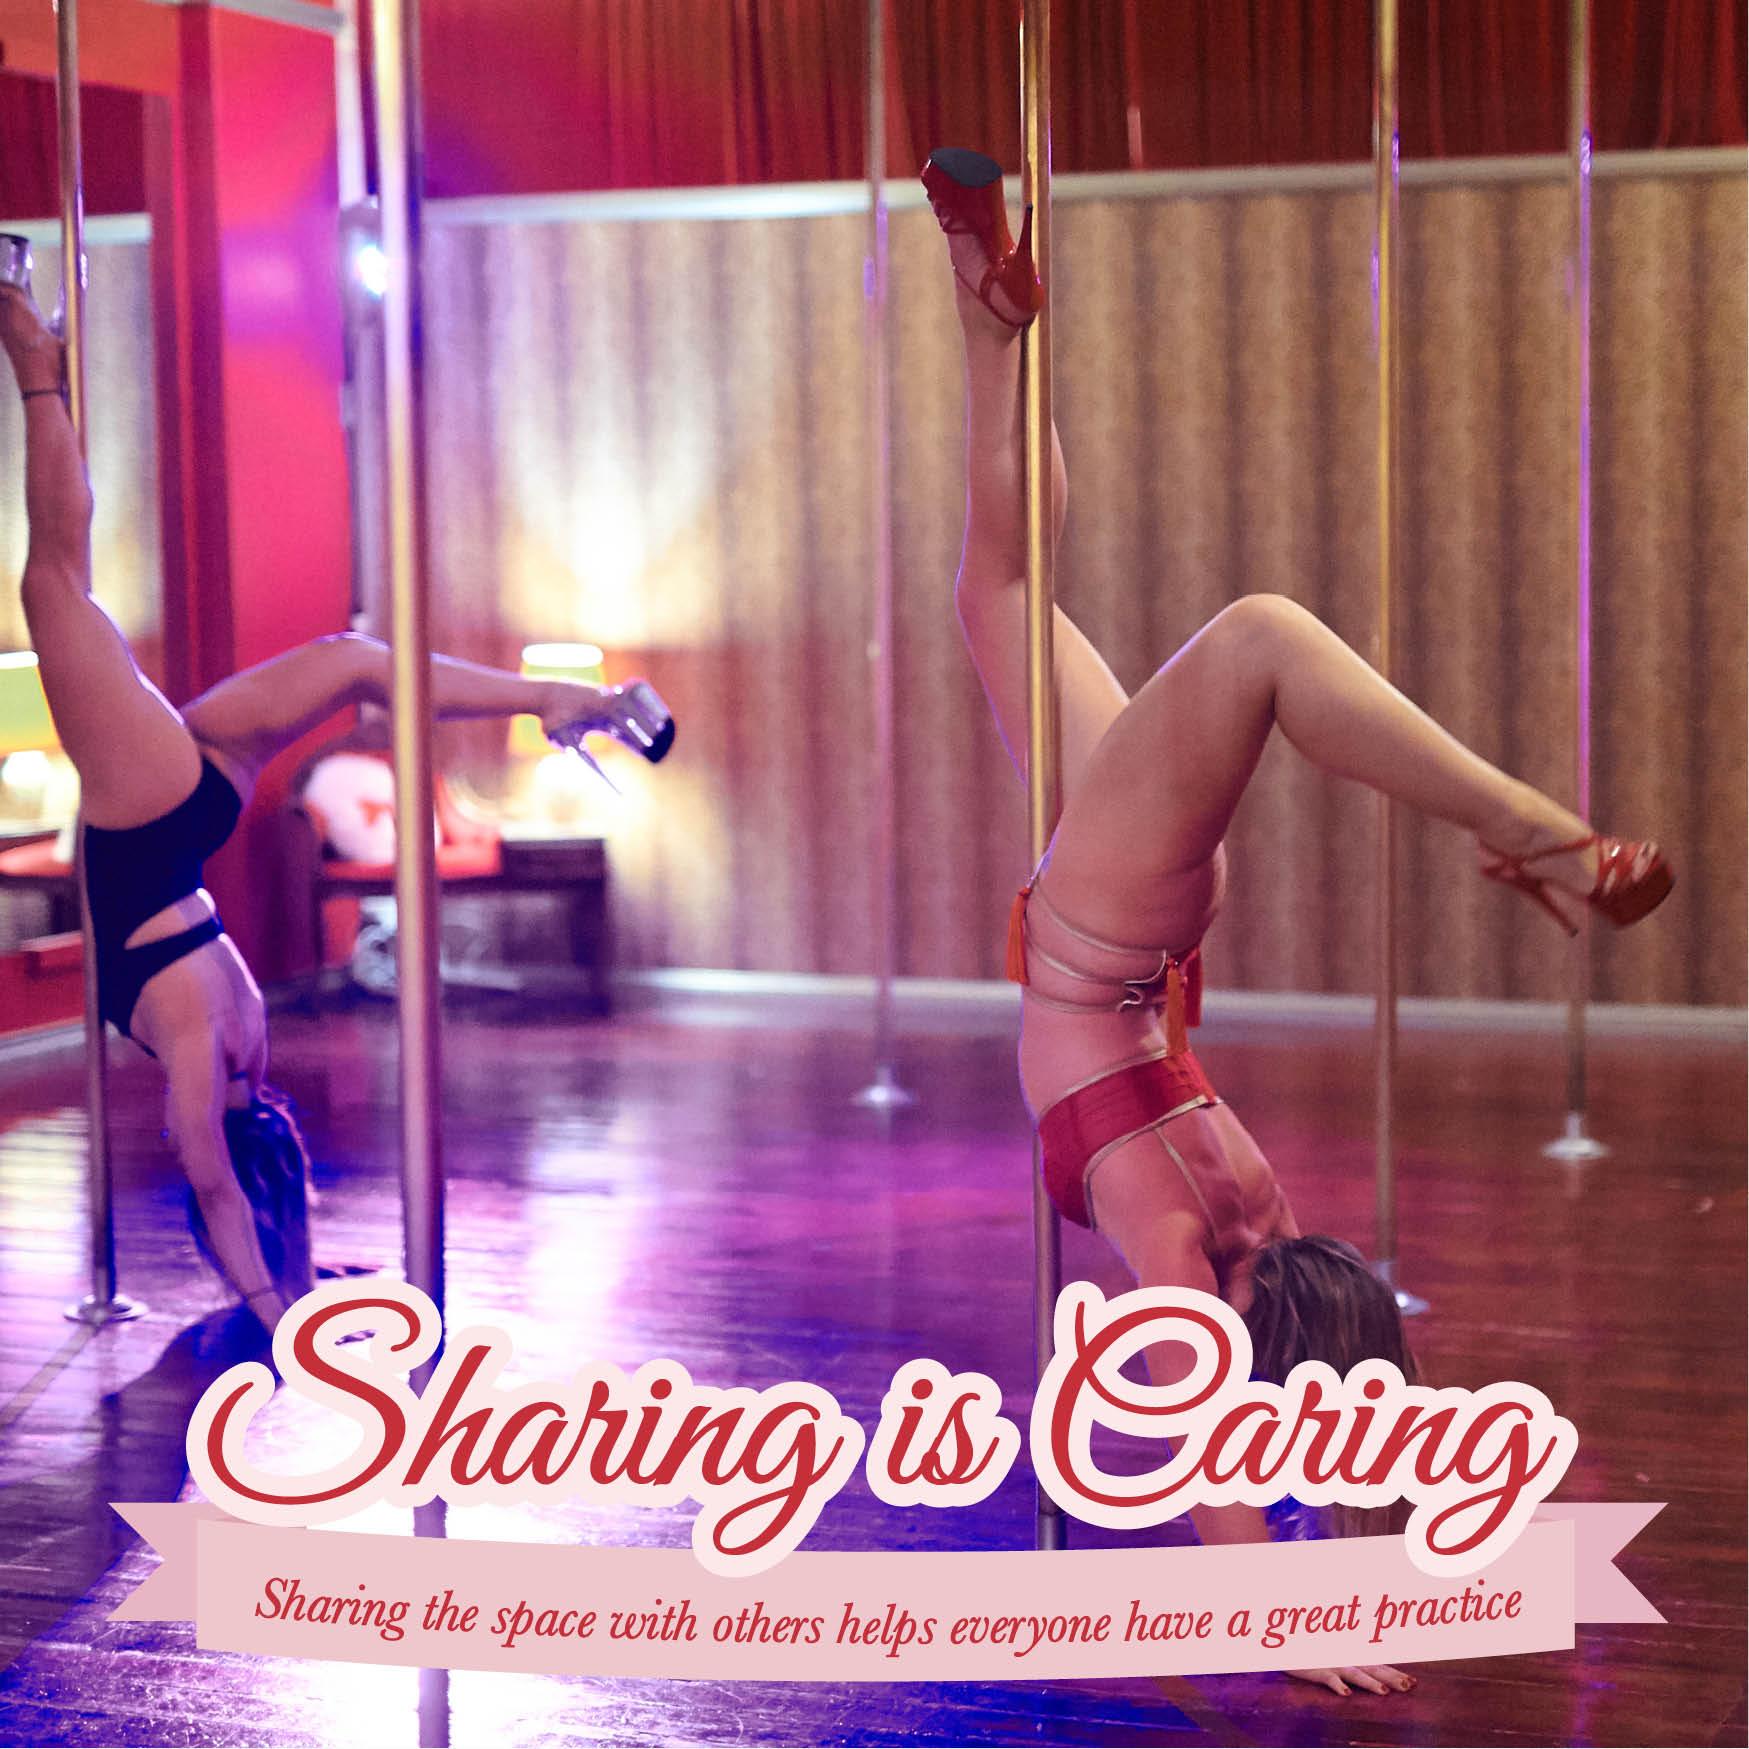 Sharing is Caring.jpg